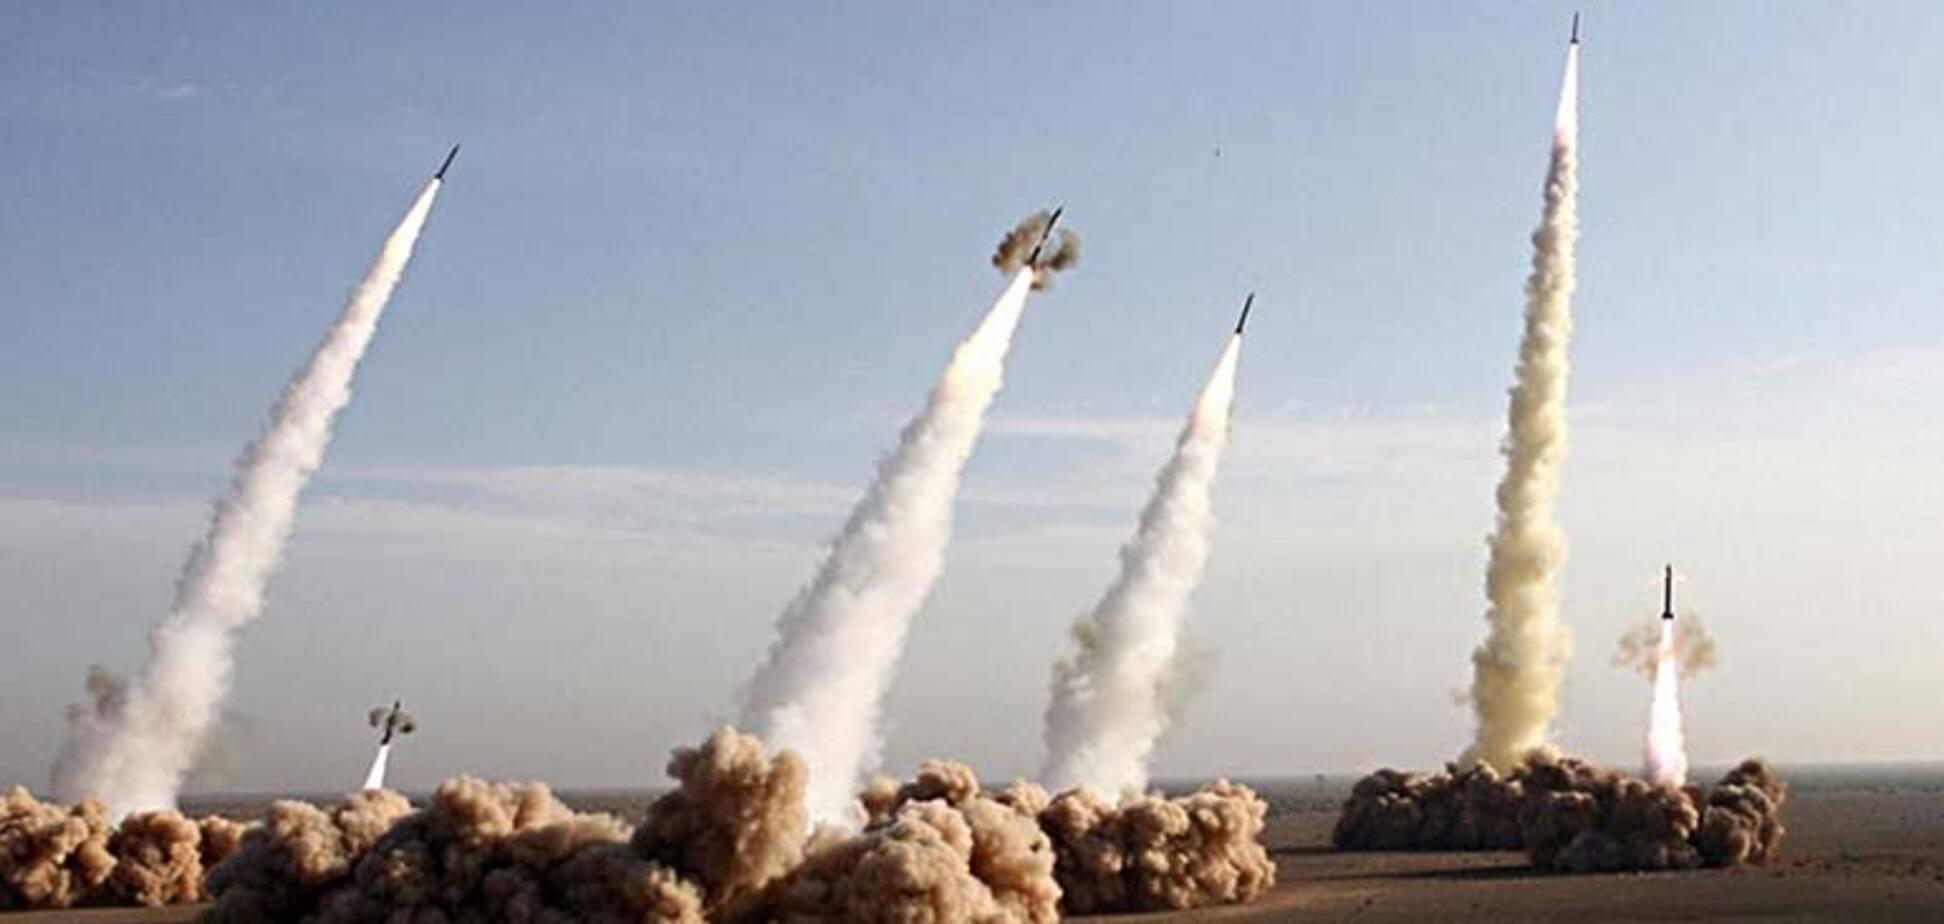 Гроші Пентагону для України: генерал нагадав про ракети по $ 1 млрд за штуку